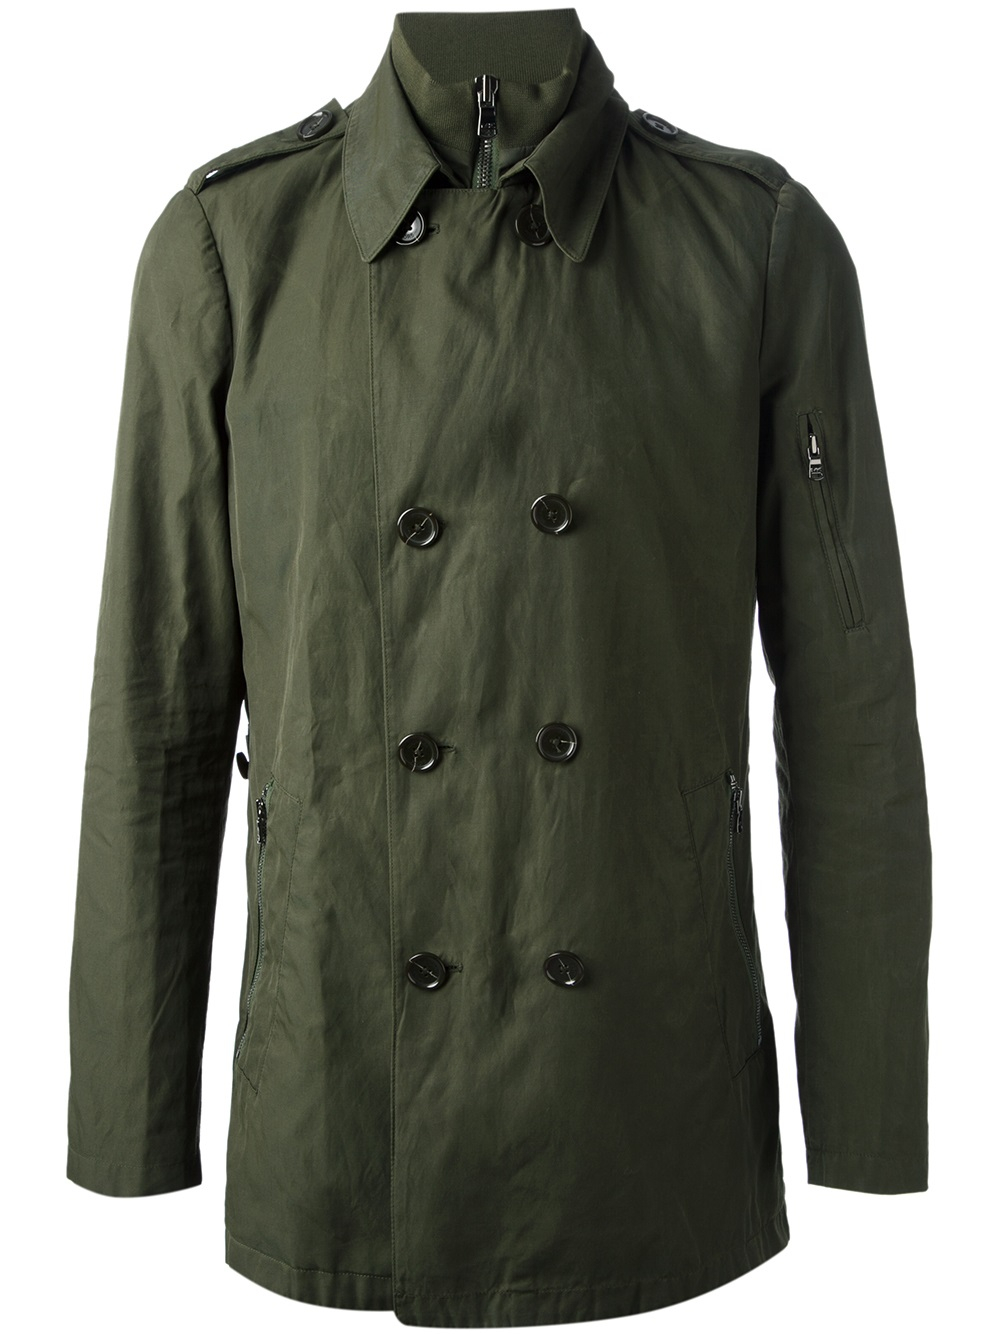 Michael Kors Military Trench Coat In Green For Men Lyst